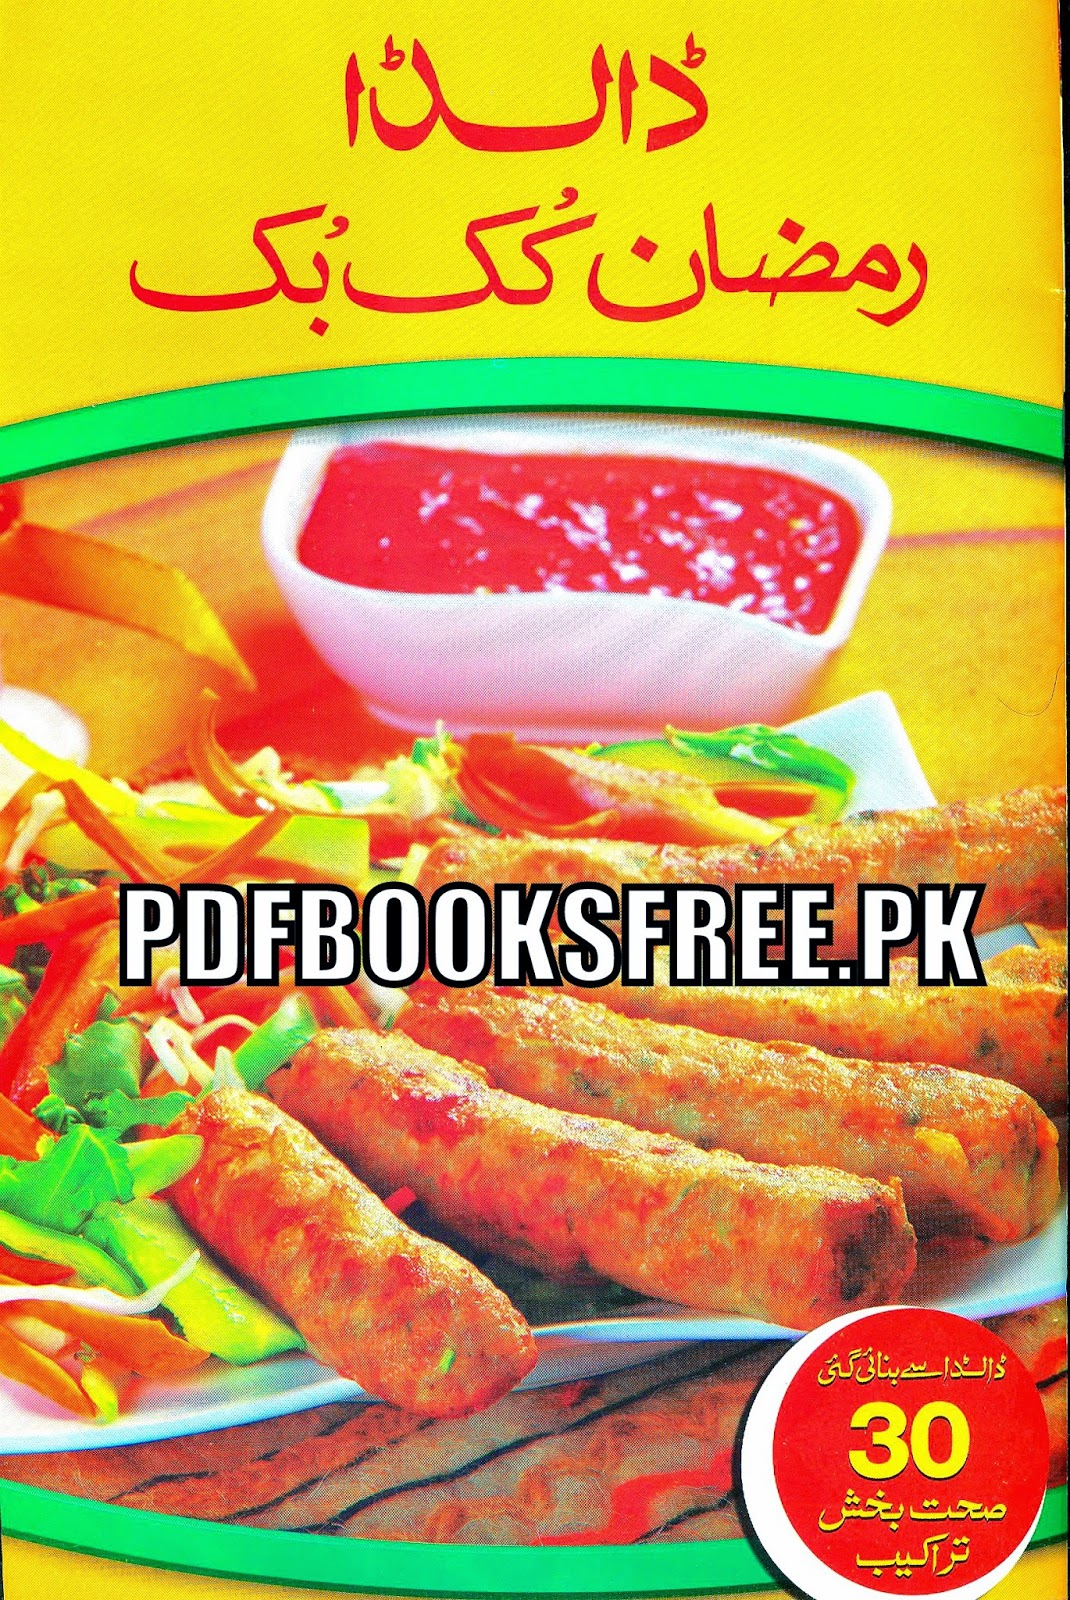 Dalda Ramadan Cook Book - Dalda Ramadan Cookbook July 2014